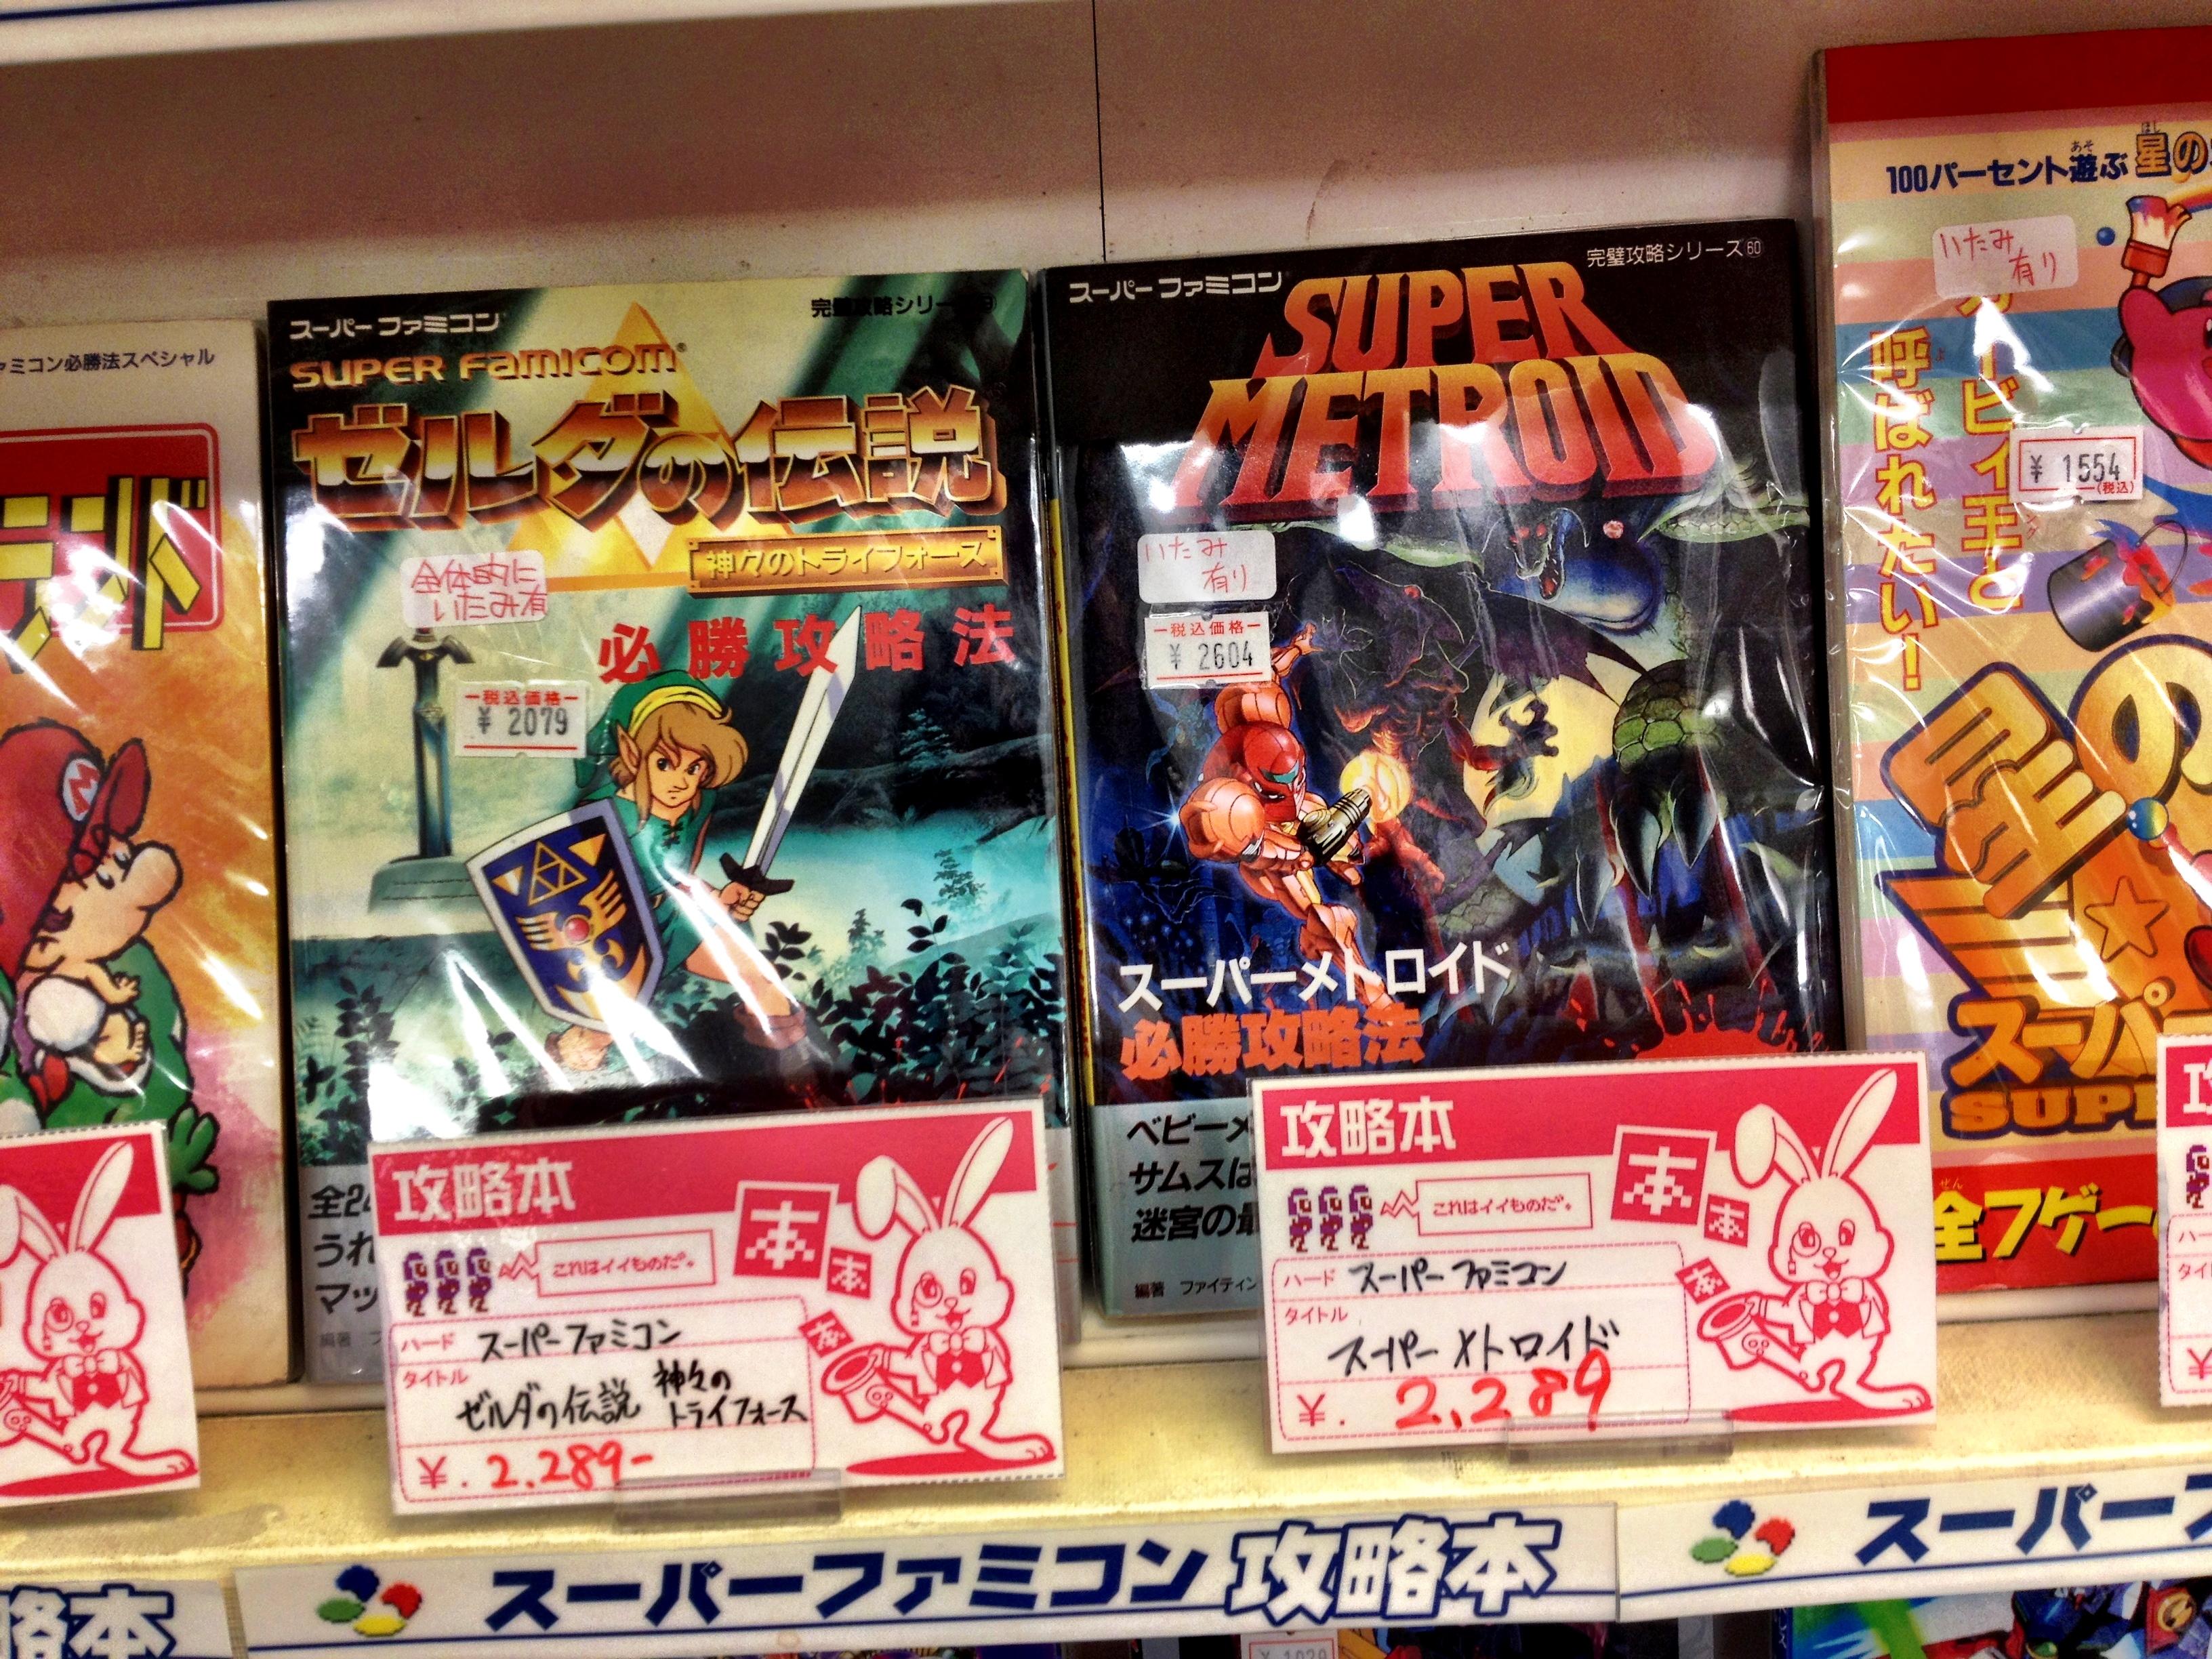 Retro Gaming Store In Japan Retro Video Gaming